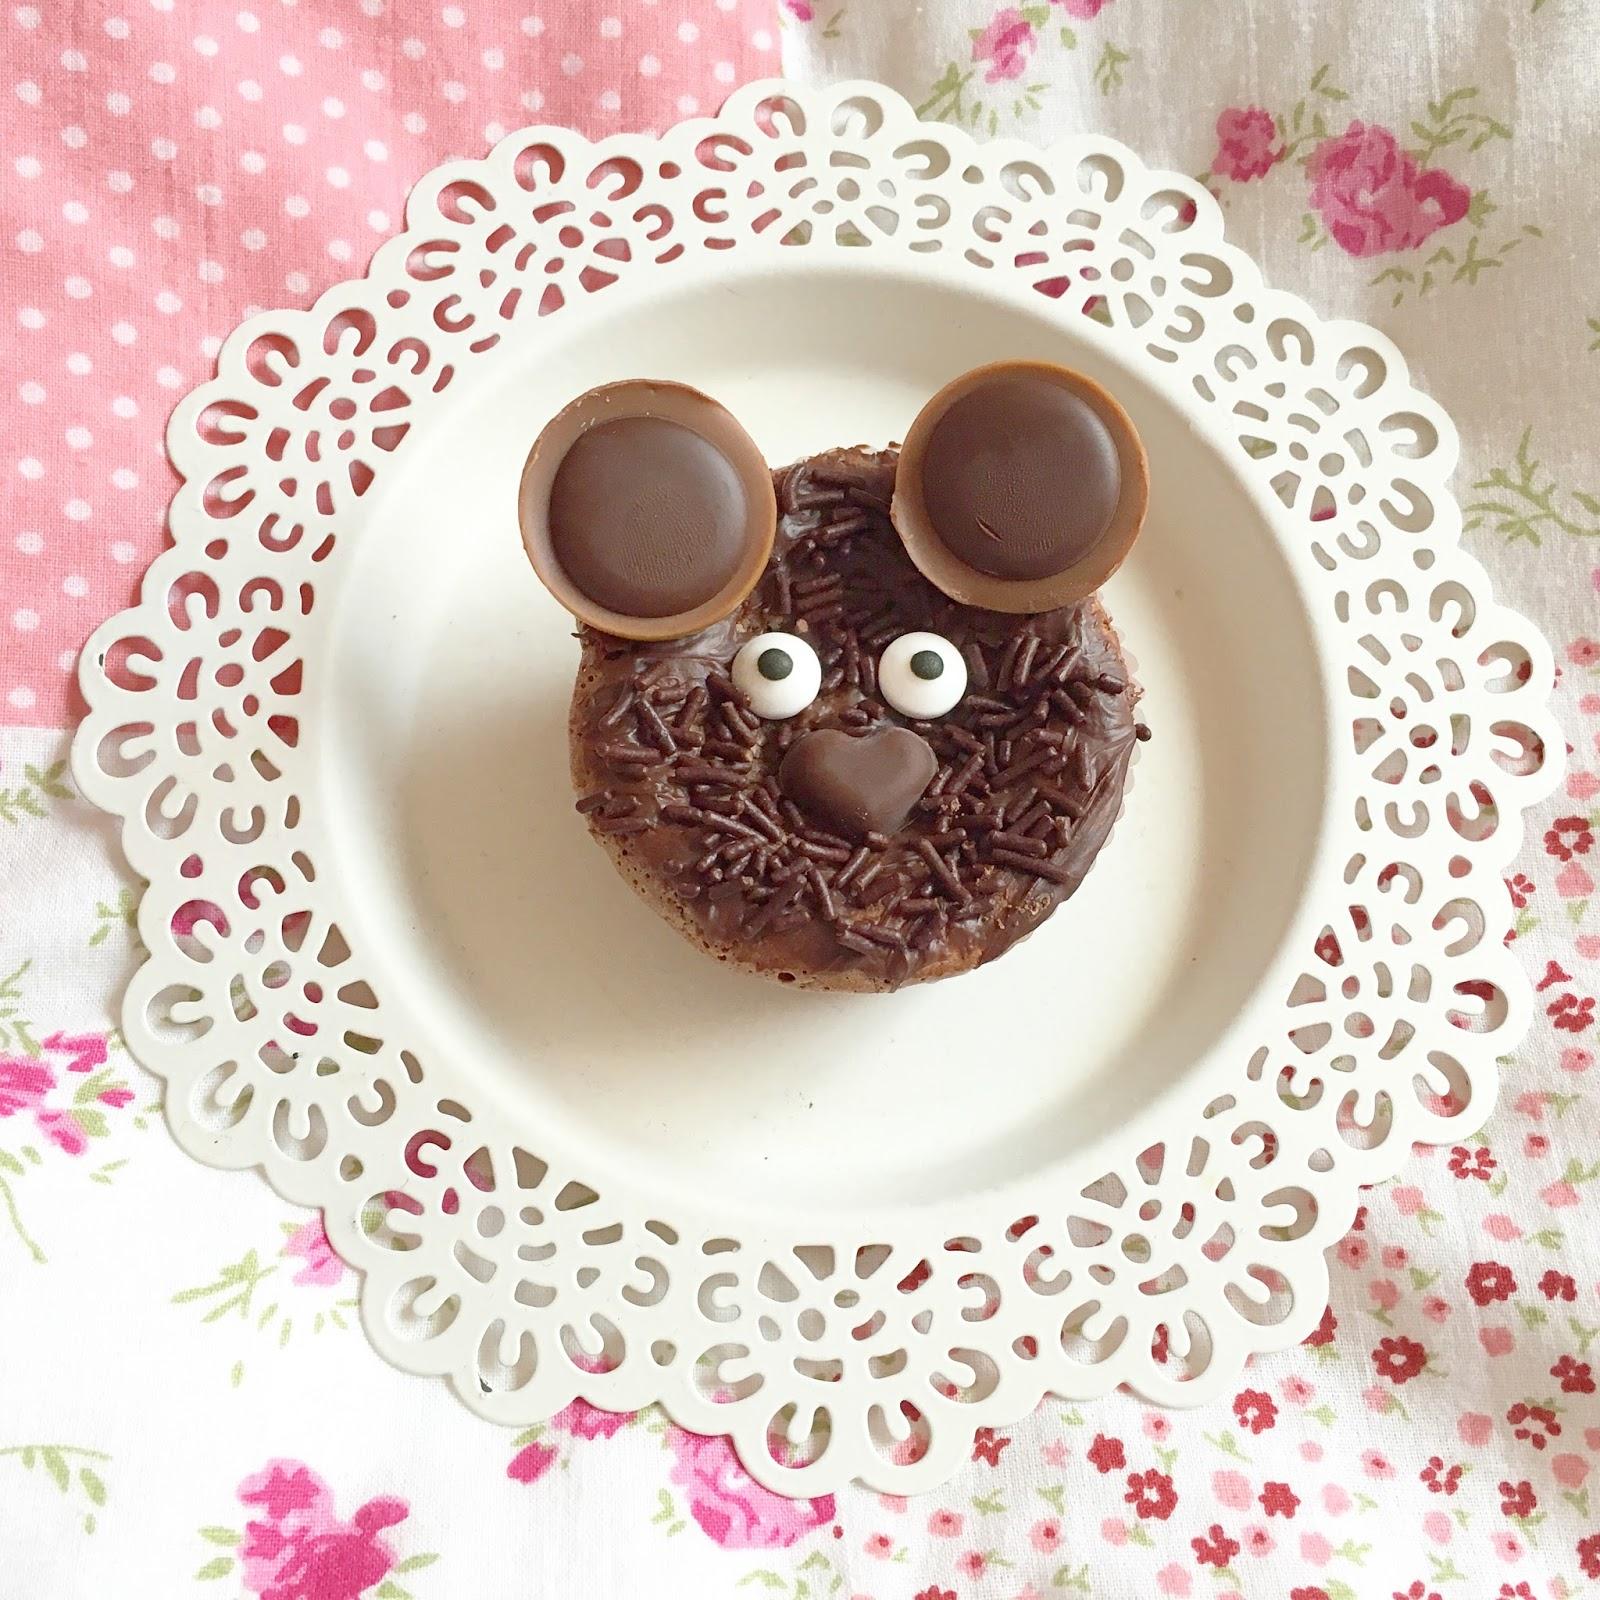 chr ii st ii na teddy schoko muffins mit fl ssigem kern. Black Bedroom Furniture Sets. Home Design Ideas